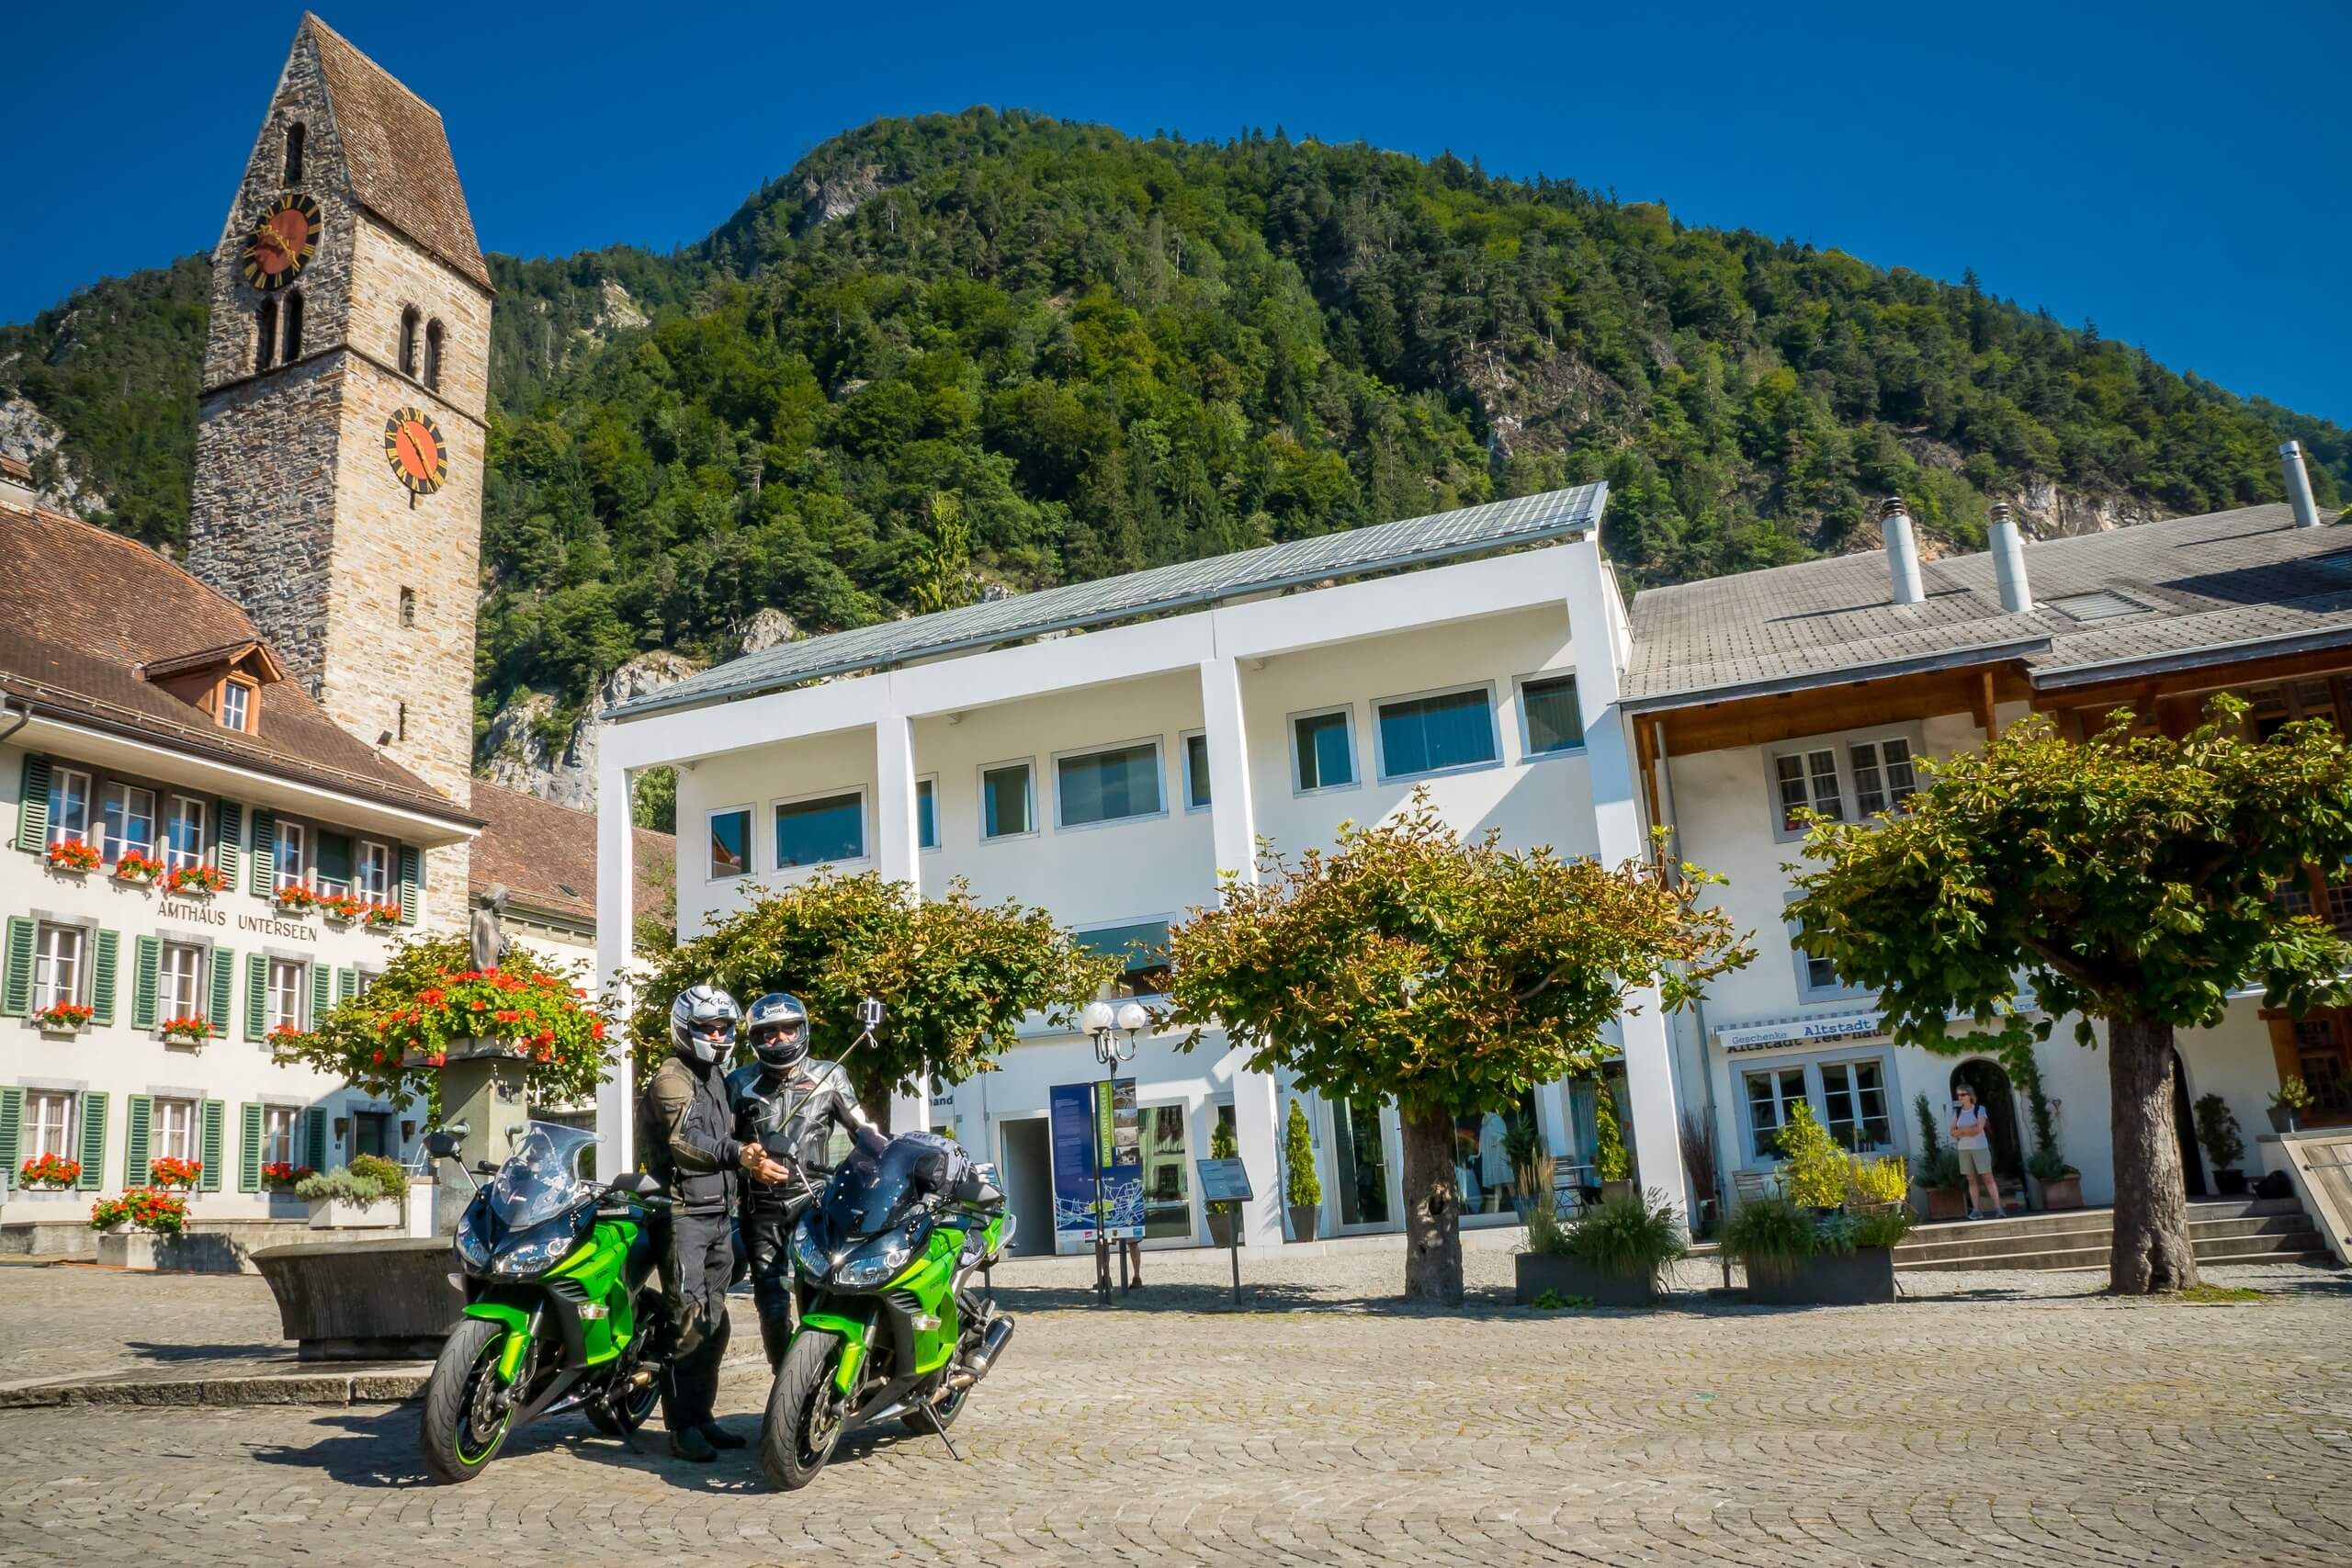 grand-tour-of-switzerland-thun-motorrad-fahren-sommer